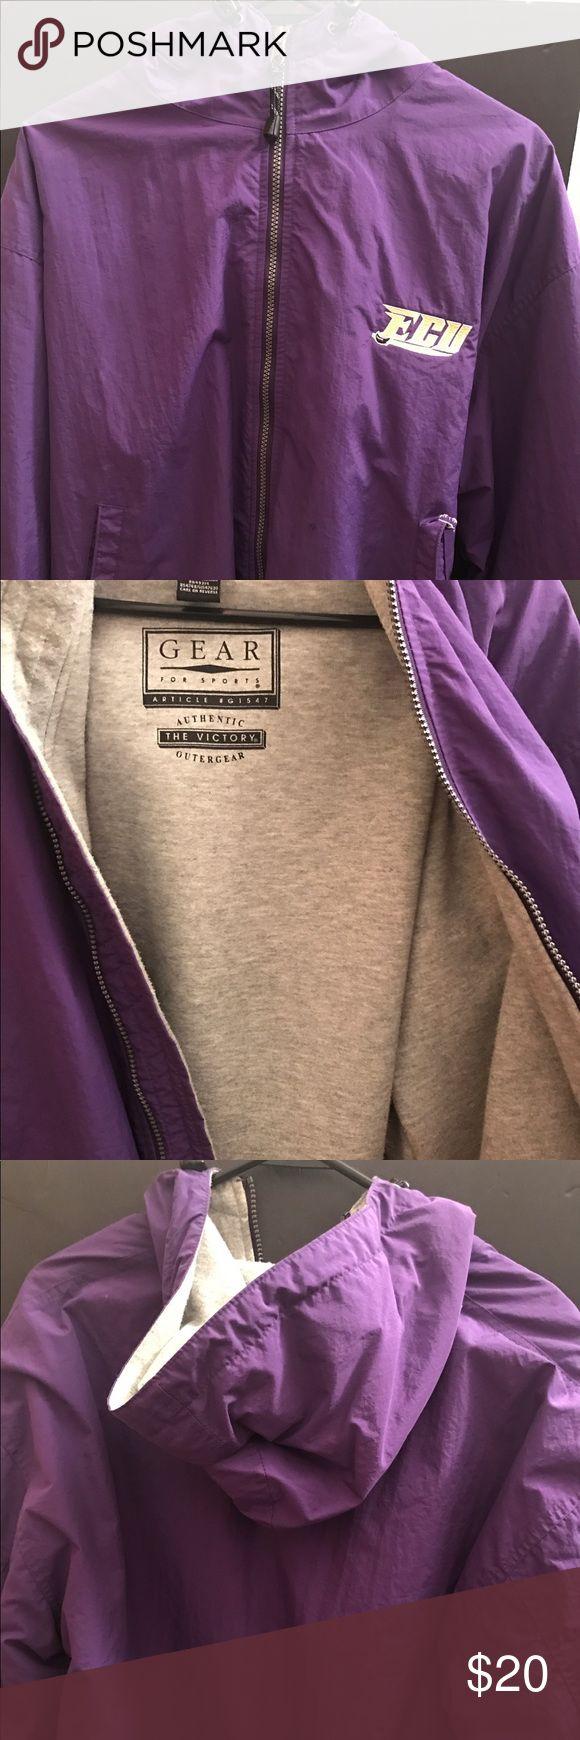 Heavy gear East Carolina University Jacket Purple ECU heavy gear jacket with grey lining. Size Small! Never worn! Jackets & Coats